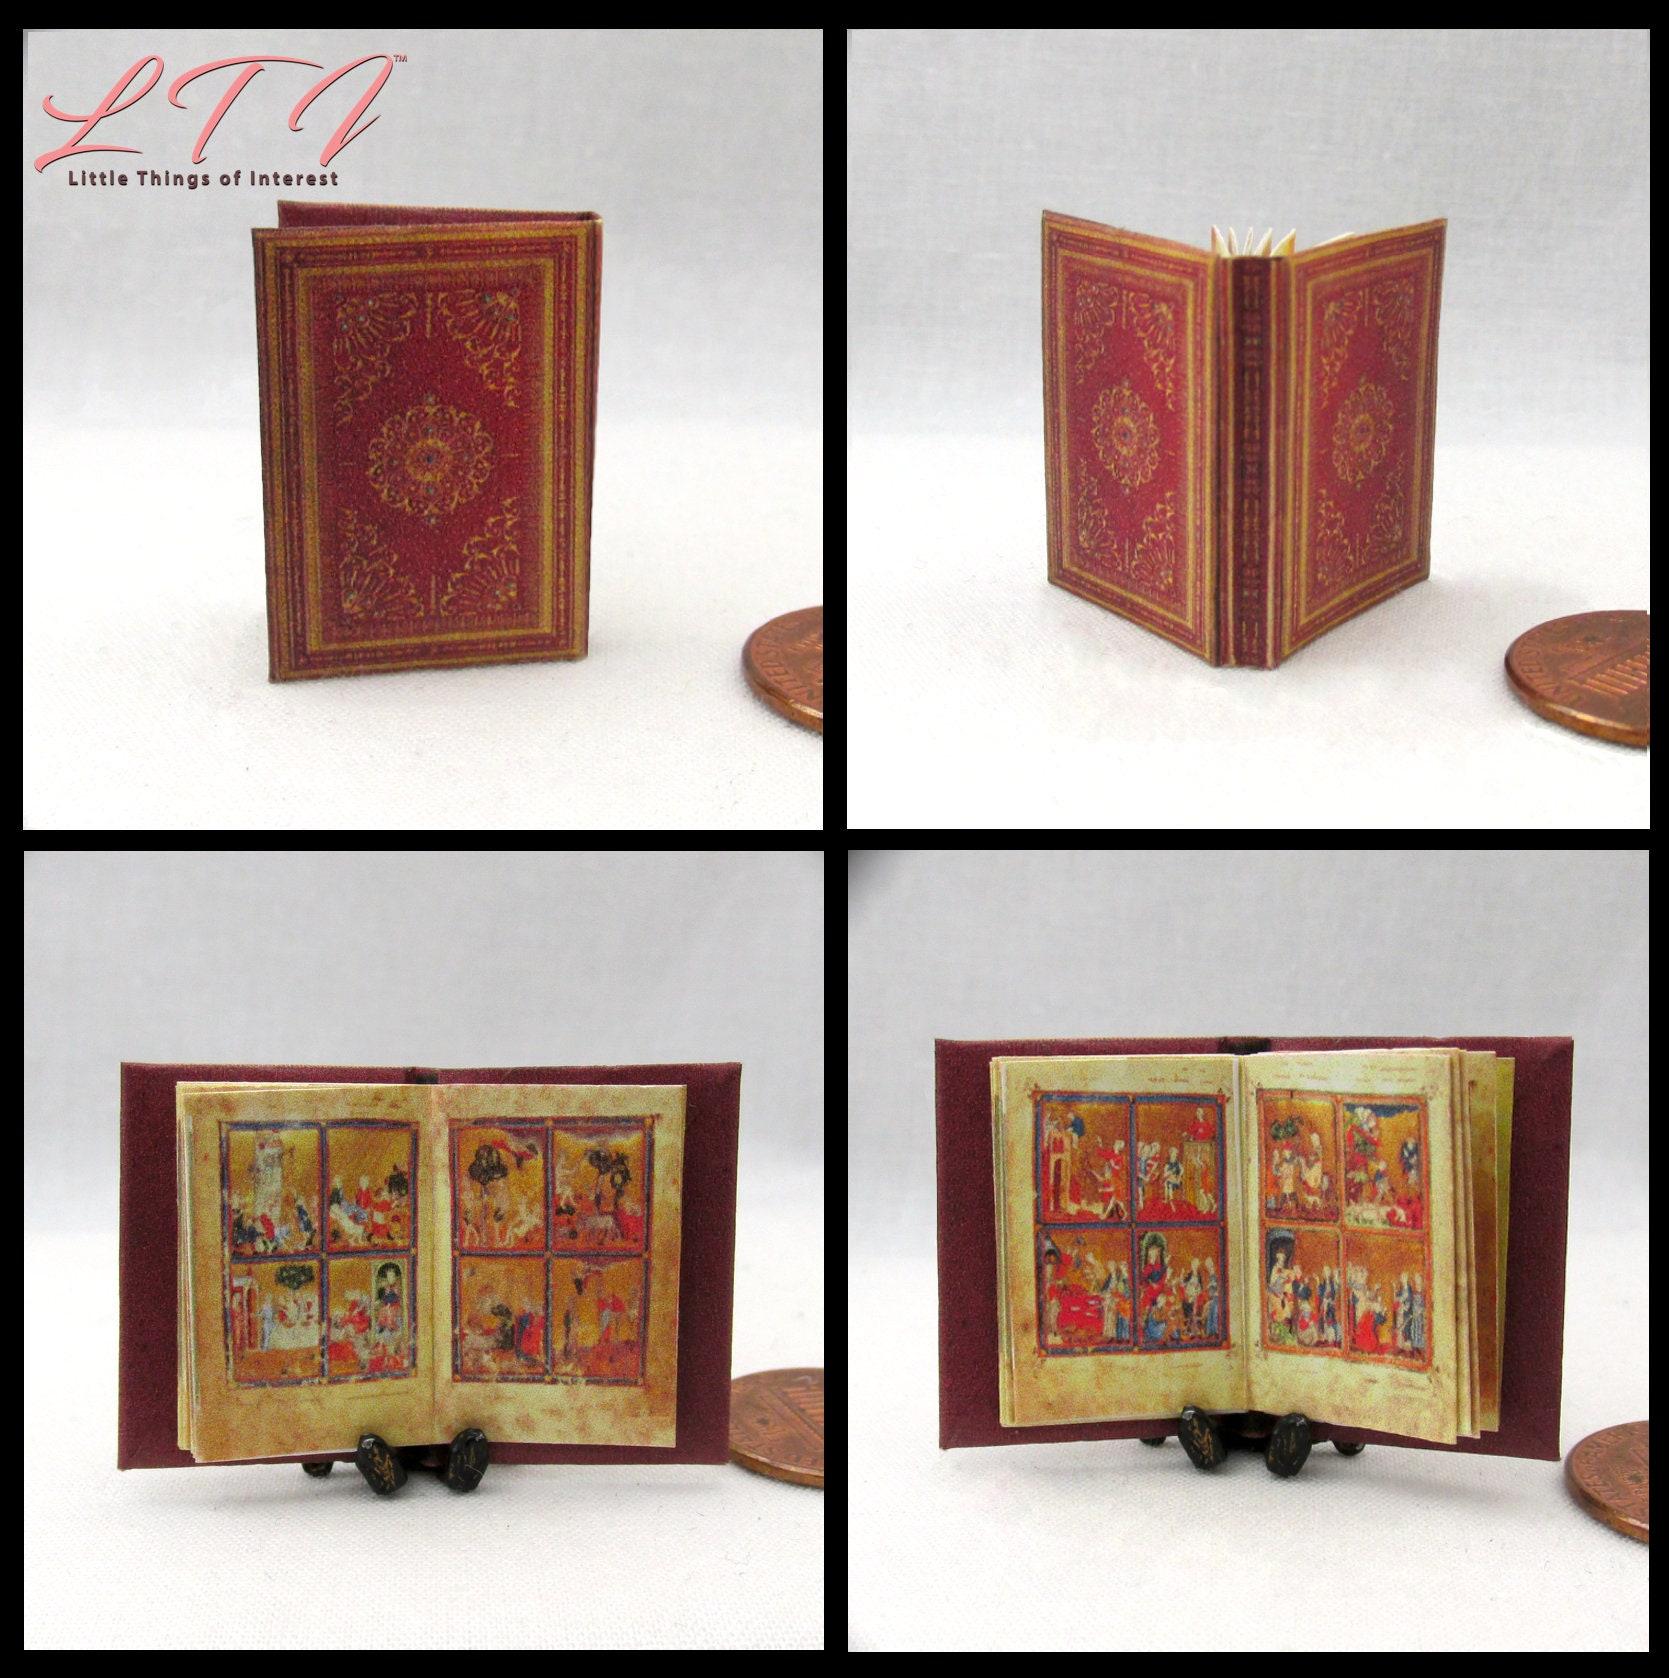 HEBREW GOLDEN HAGGADAH Miniature Book Dollhouse 1:12 Scale